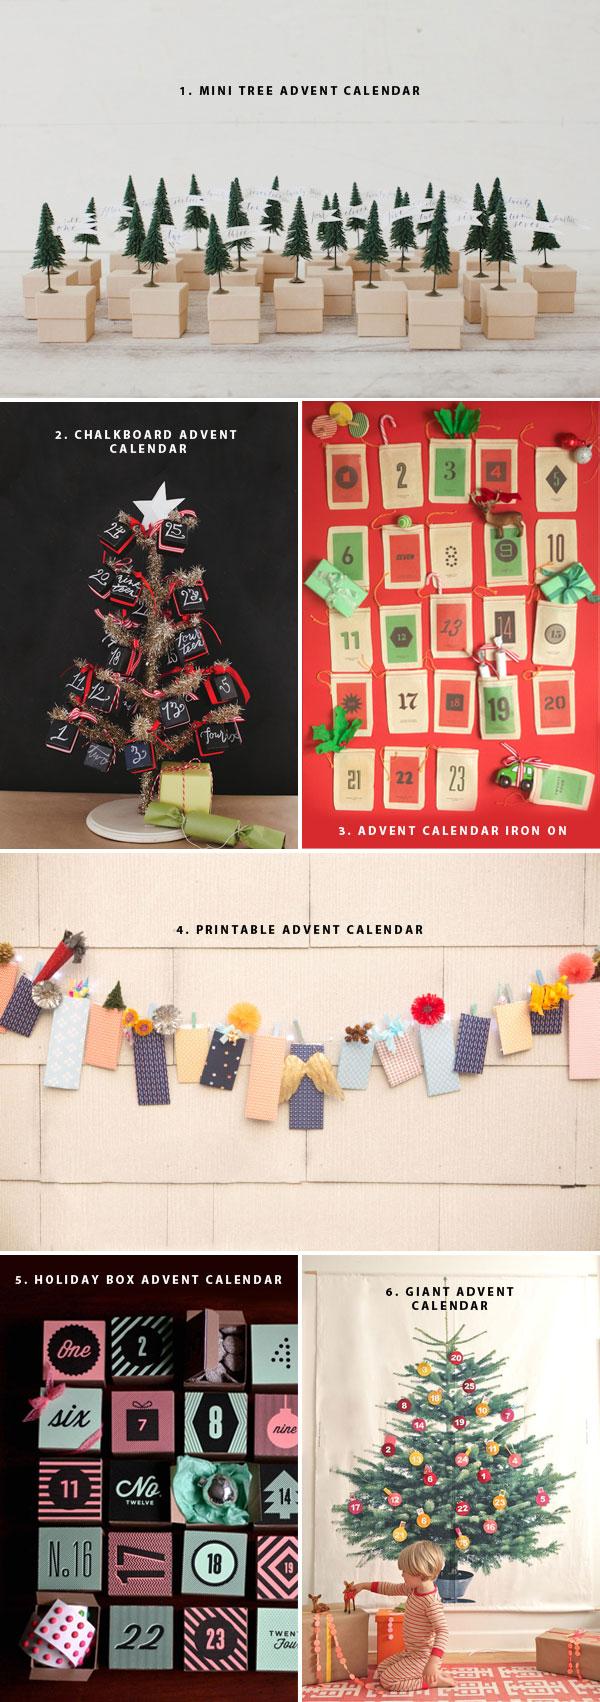 Advent Calendar Ideas | Oh Happy Day!